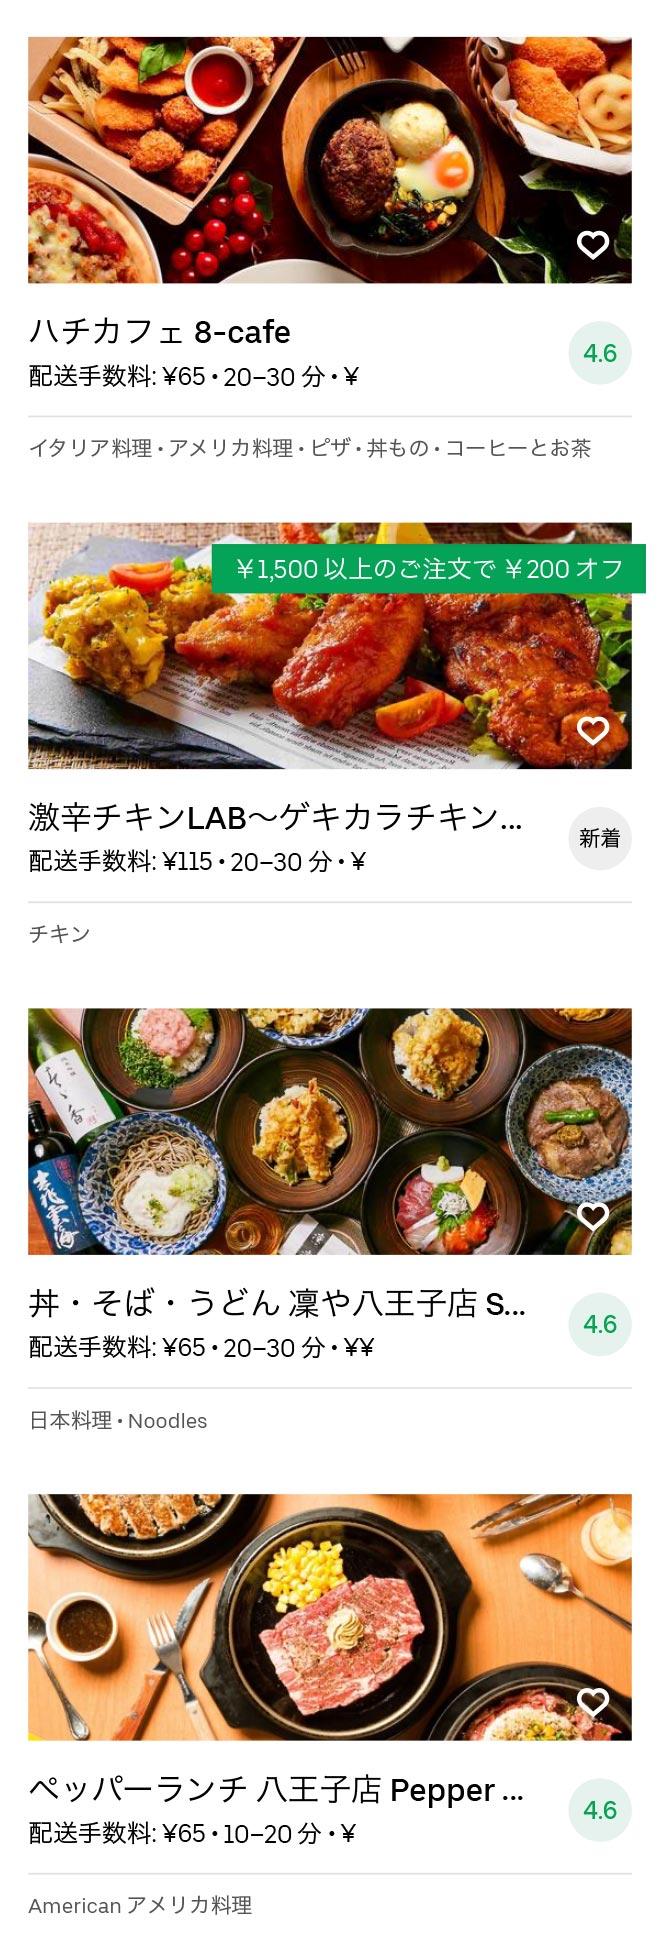 Hatioji menu 2010 10